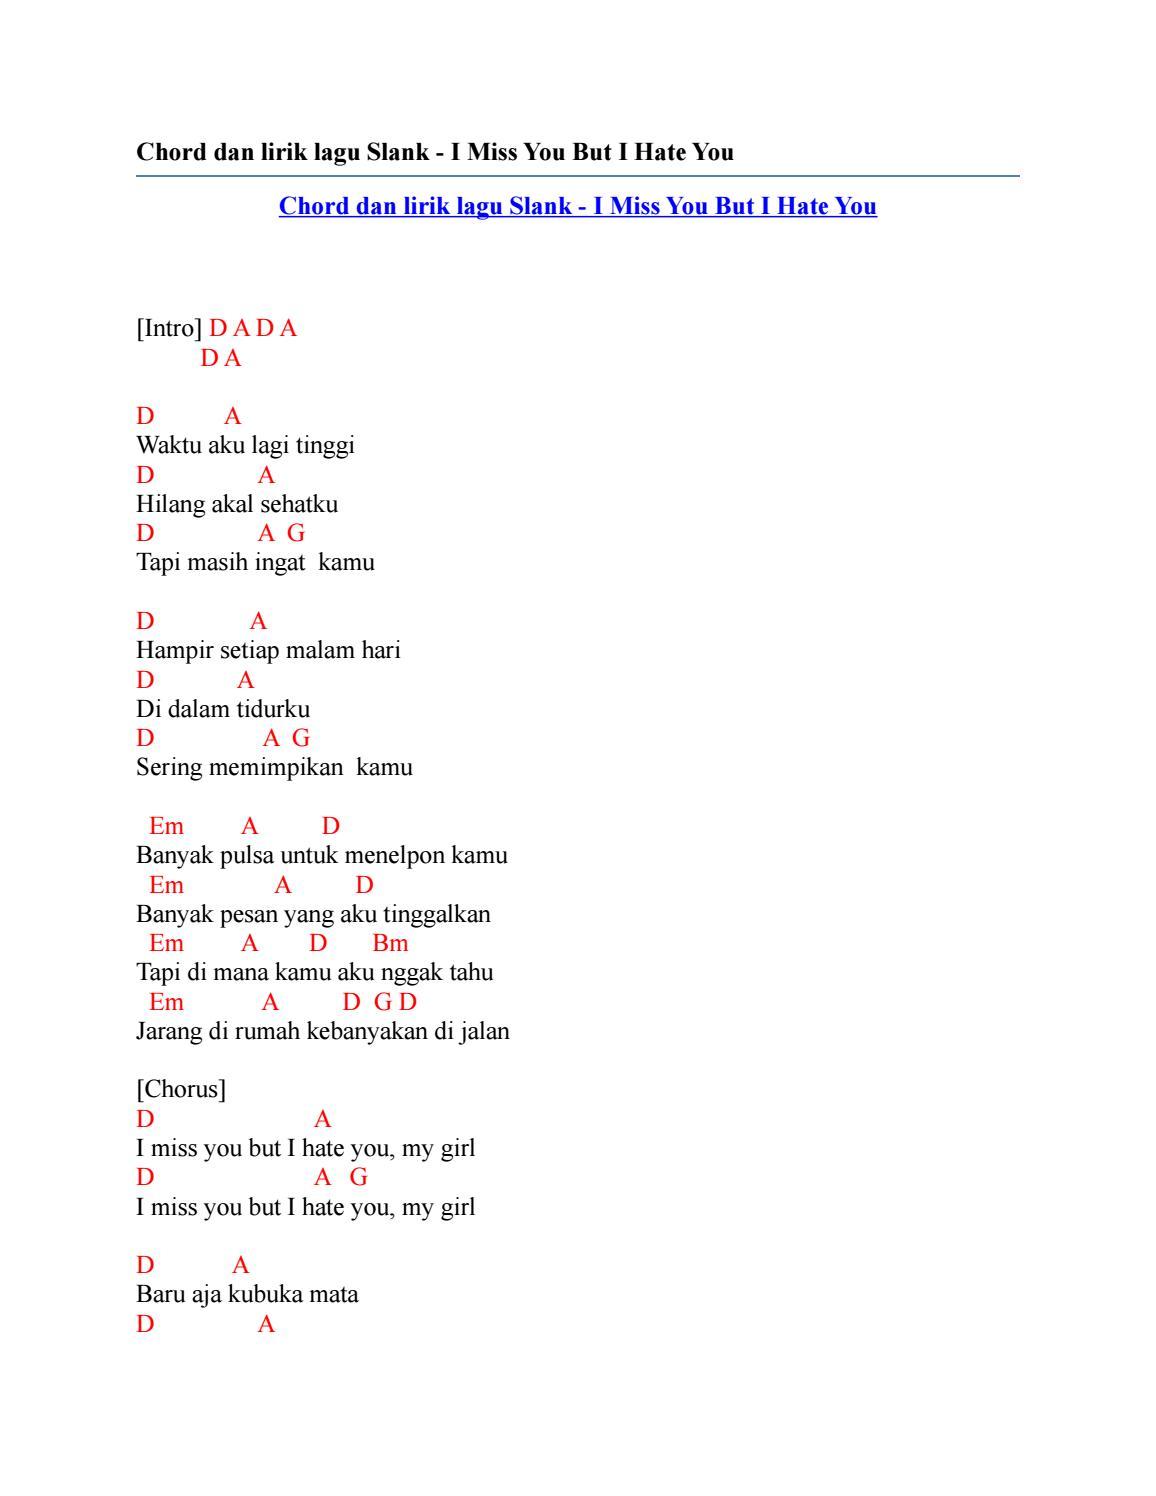 Chord Slank Terlalu Pahit : chord, slank, terlalu, pahit, Kunci, Gitar, Slank